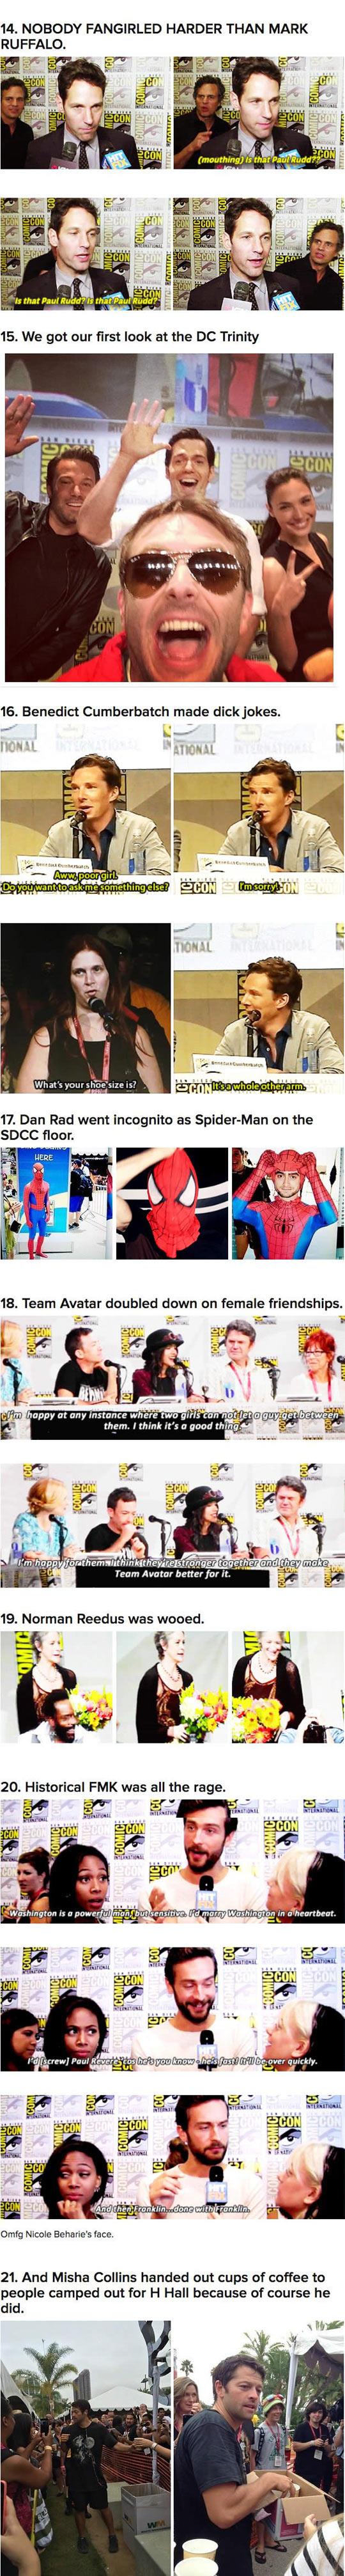 funny-San-Diego-Comic-Con-Benedict-Cumberbatch